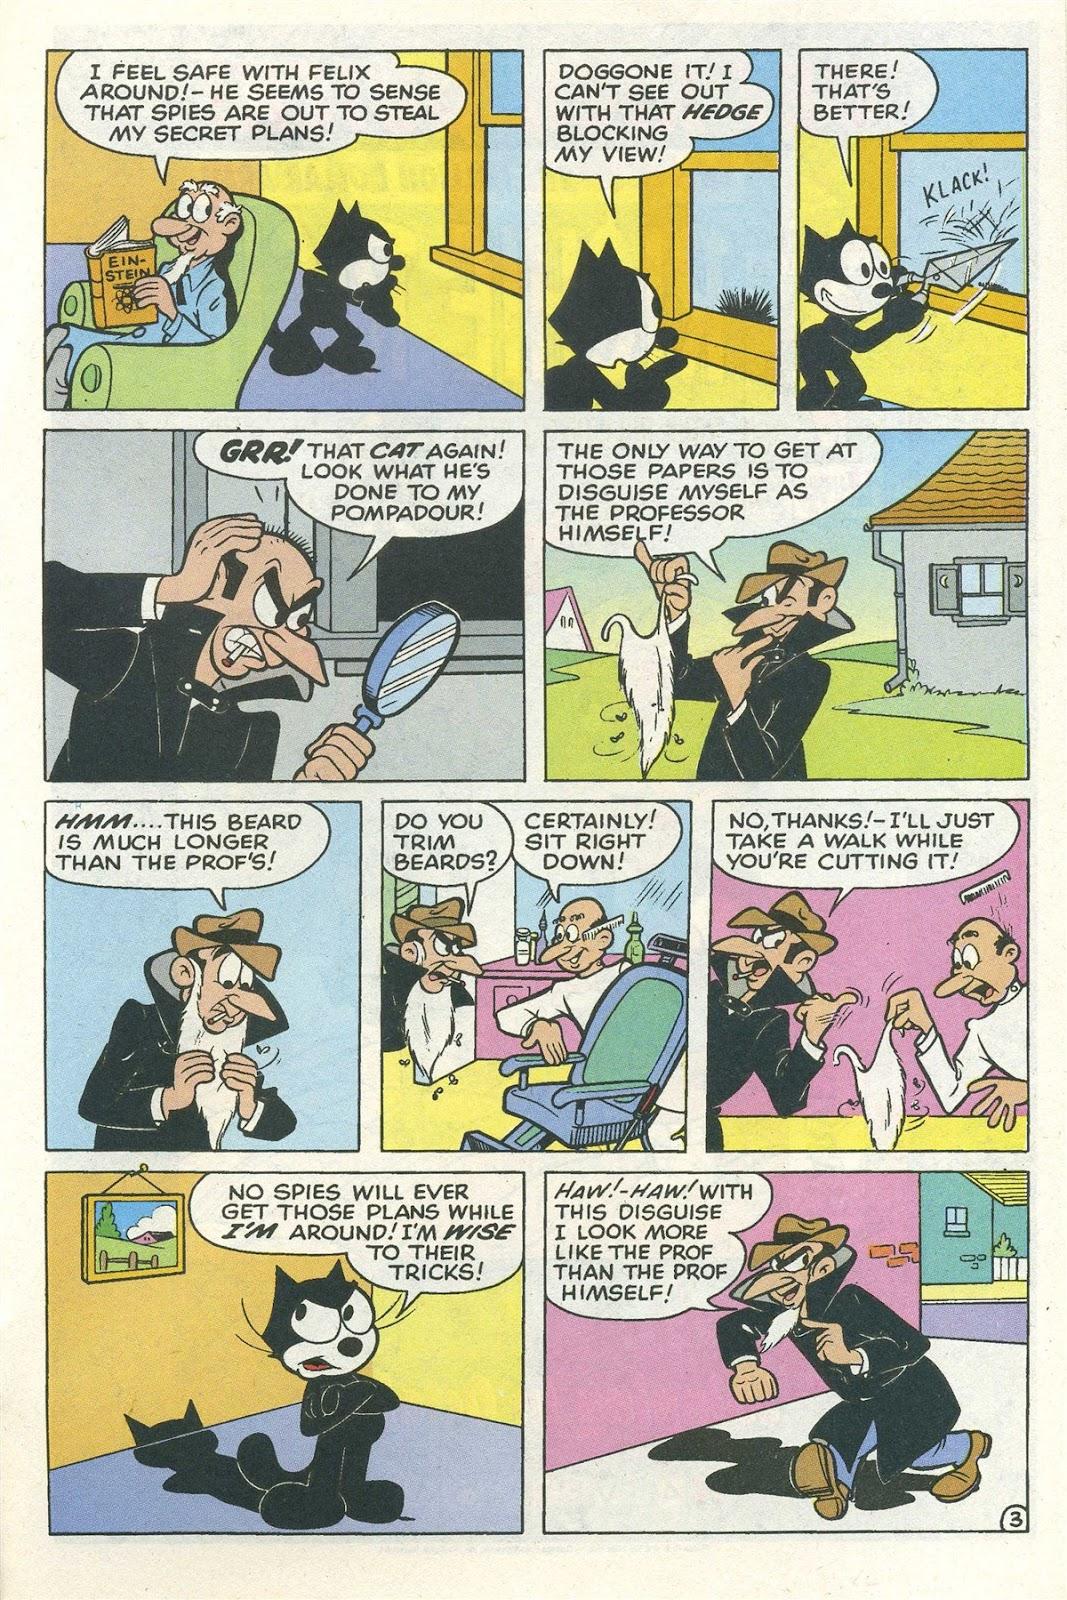 Read online Felix the Cat comic -  Issue #7 - 24